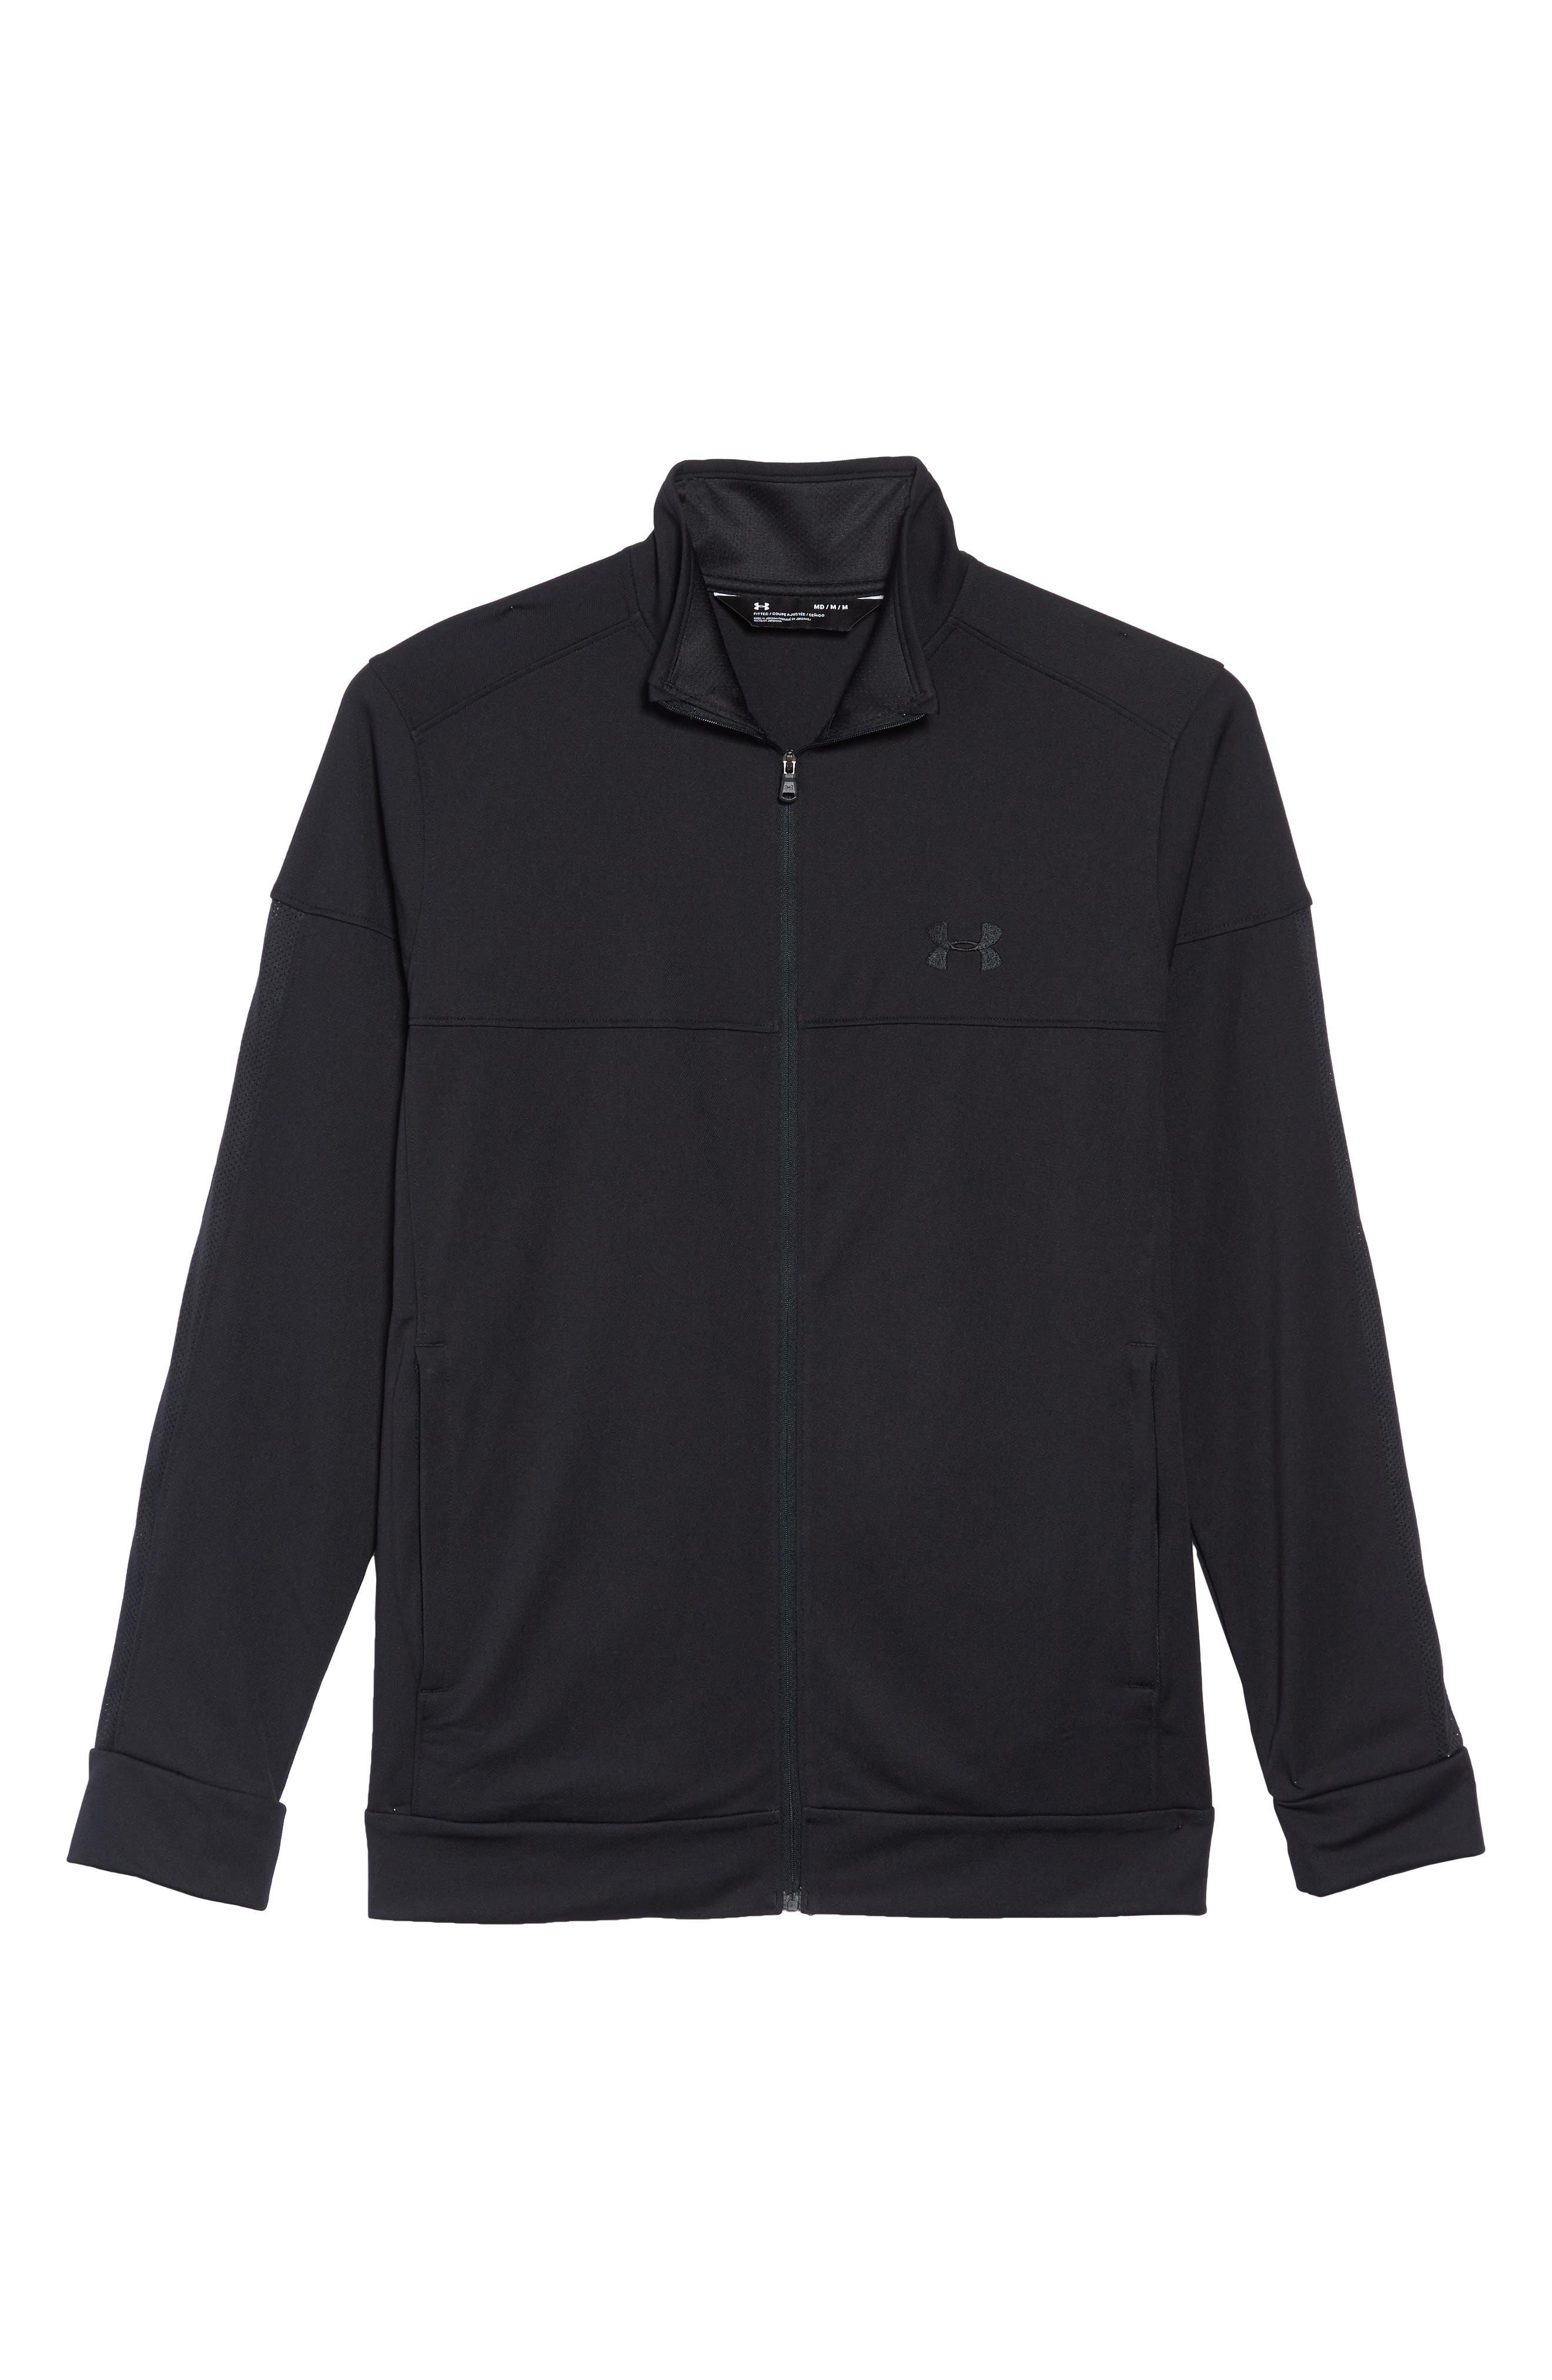 Sportstyle Piqué Track Jacket,                             Alternate thumbnail 6, color,                             BLACK / / BLACK